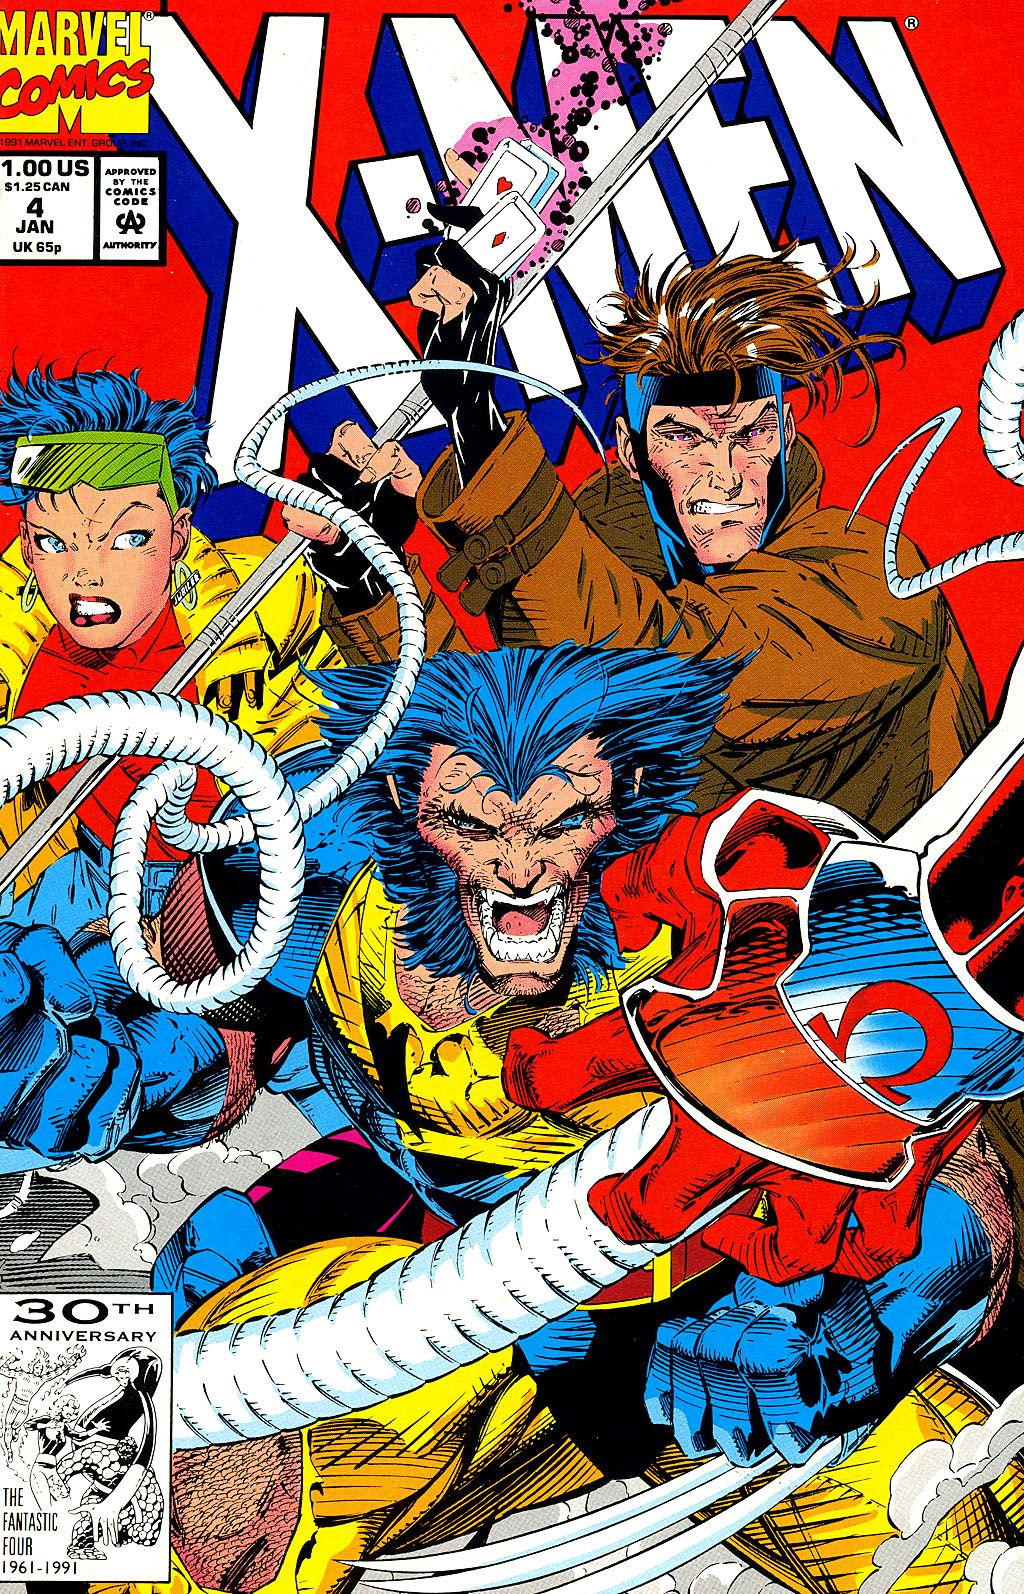 X Men 4 Cover Art Feat Jubalee Wolverine Gambit V Omega Red By Jim Lee Marvel Comics Jim Lee Art Marvel Comics Covers Comics